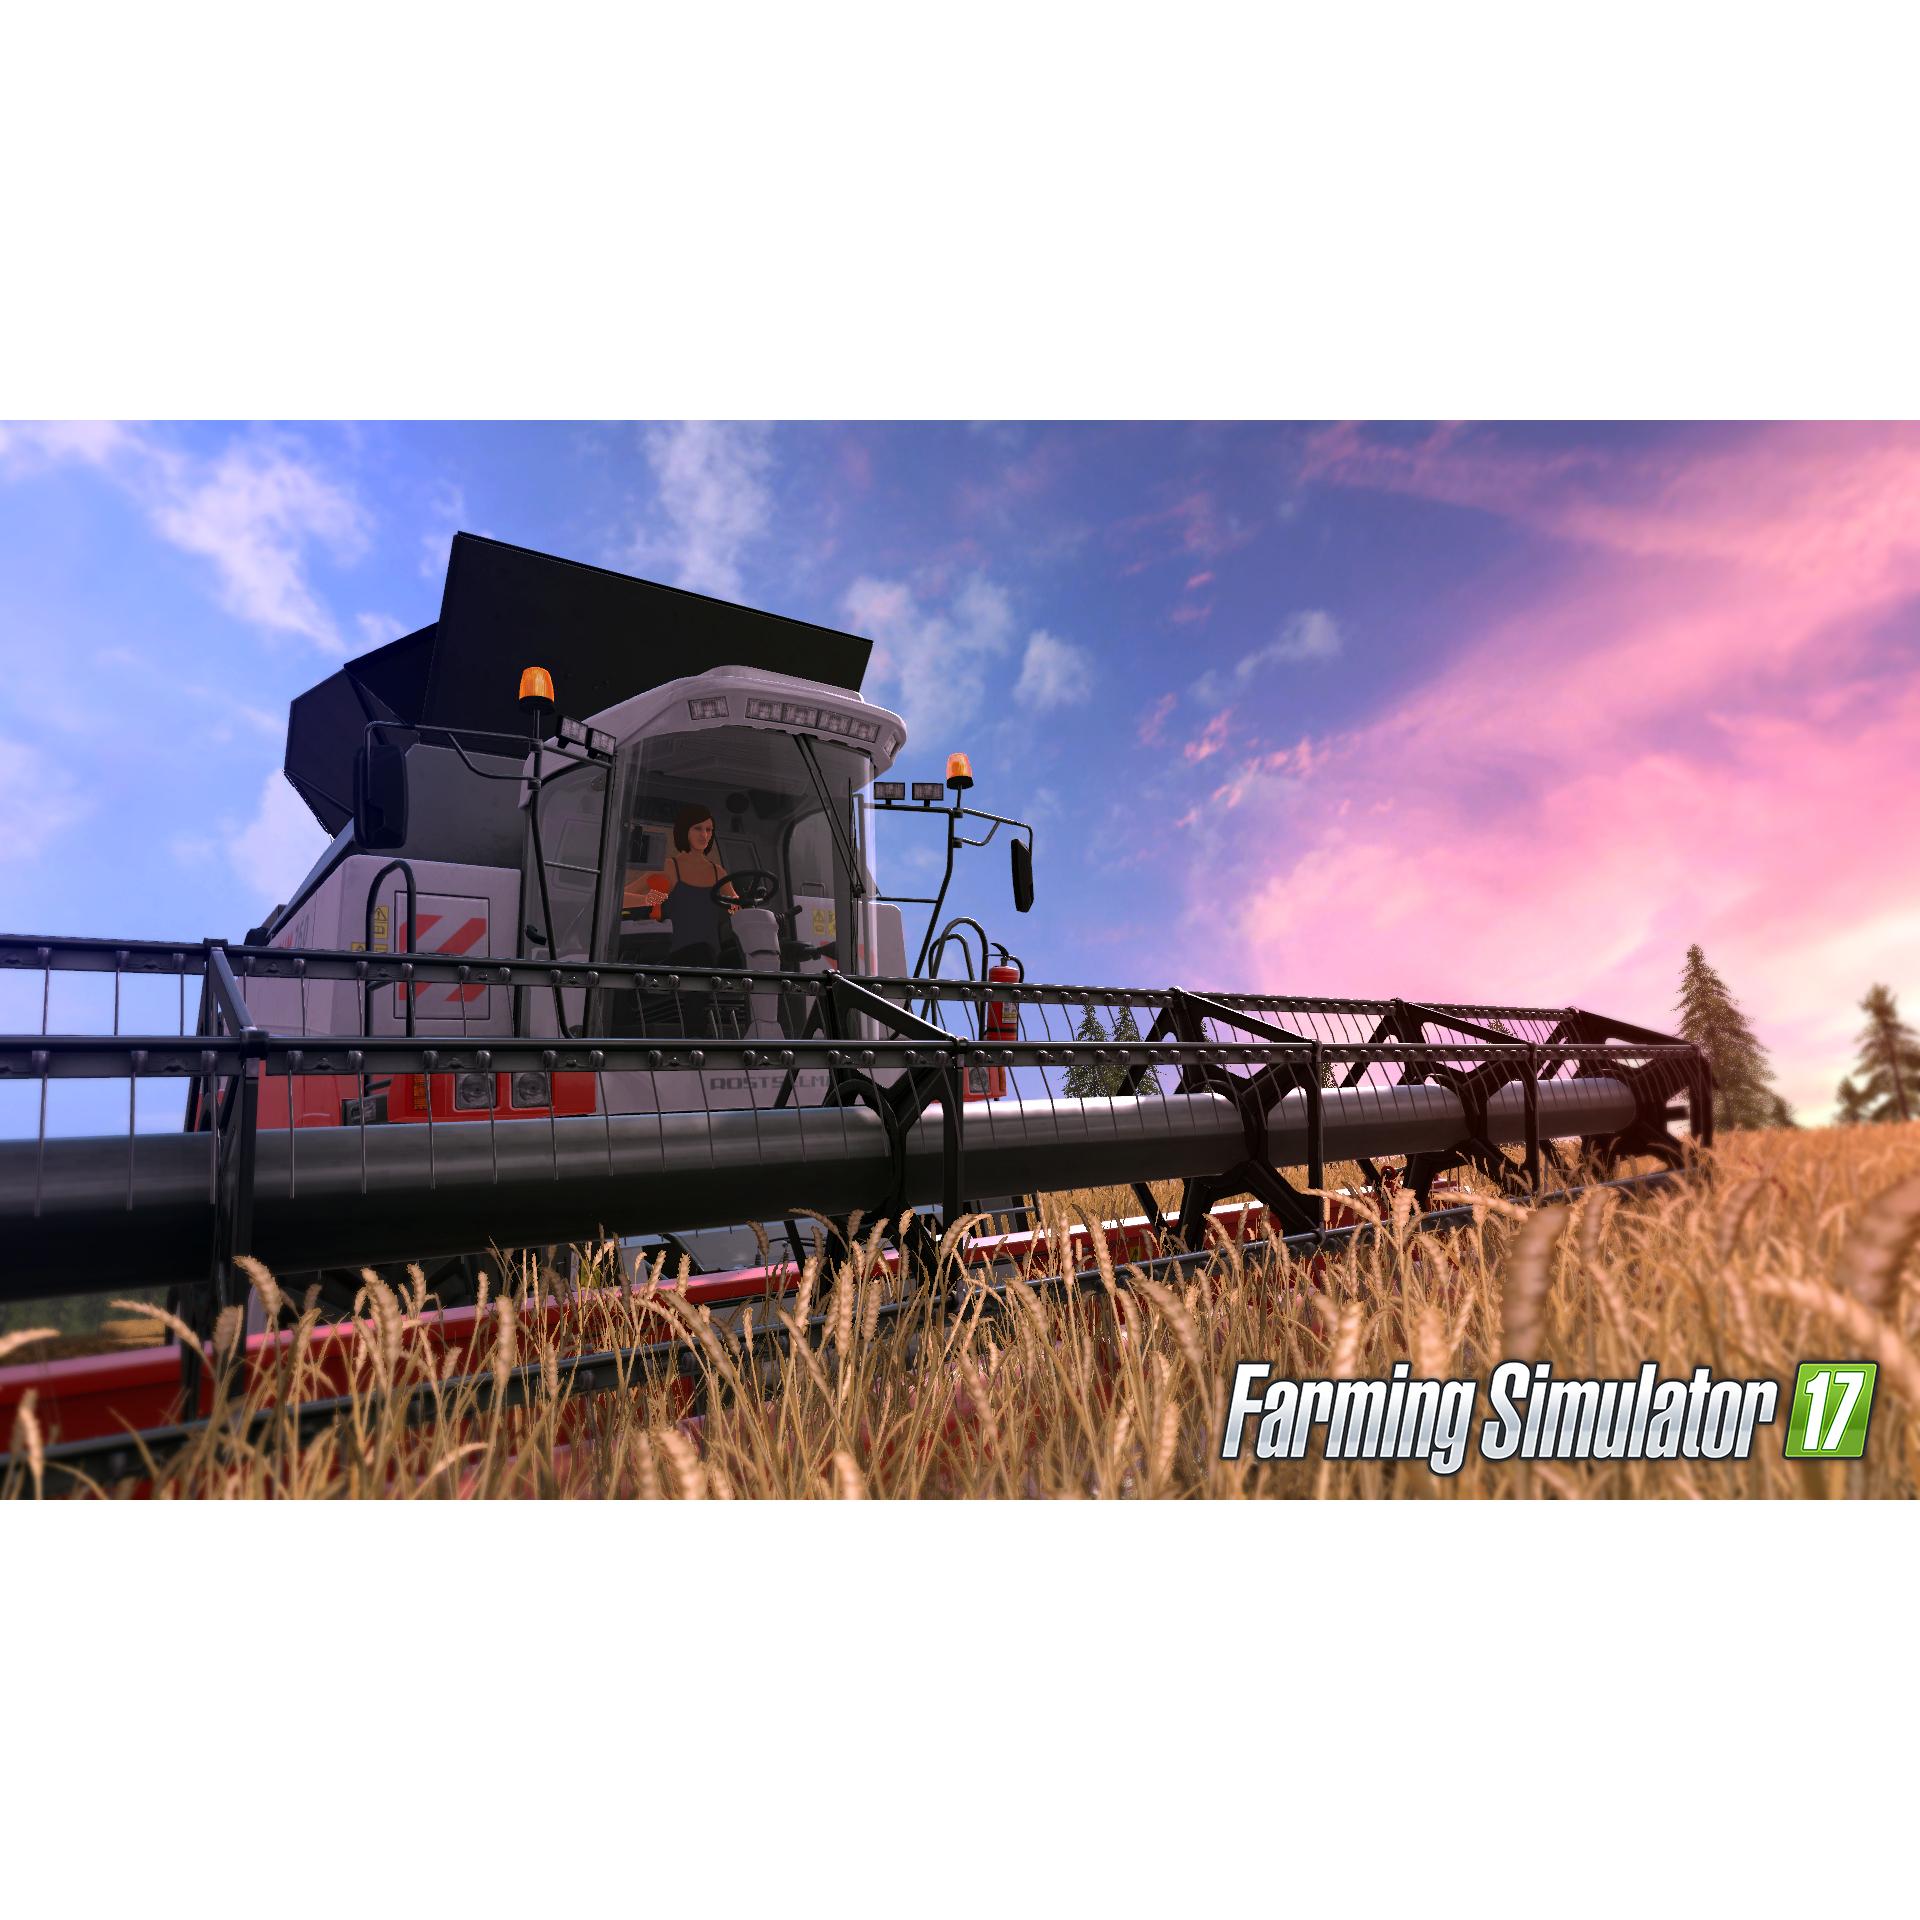 Farming simulator 17 Platinum edition, Xbox One 8